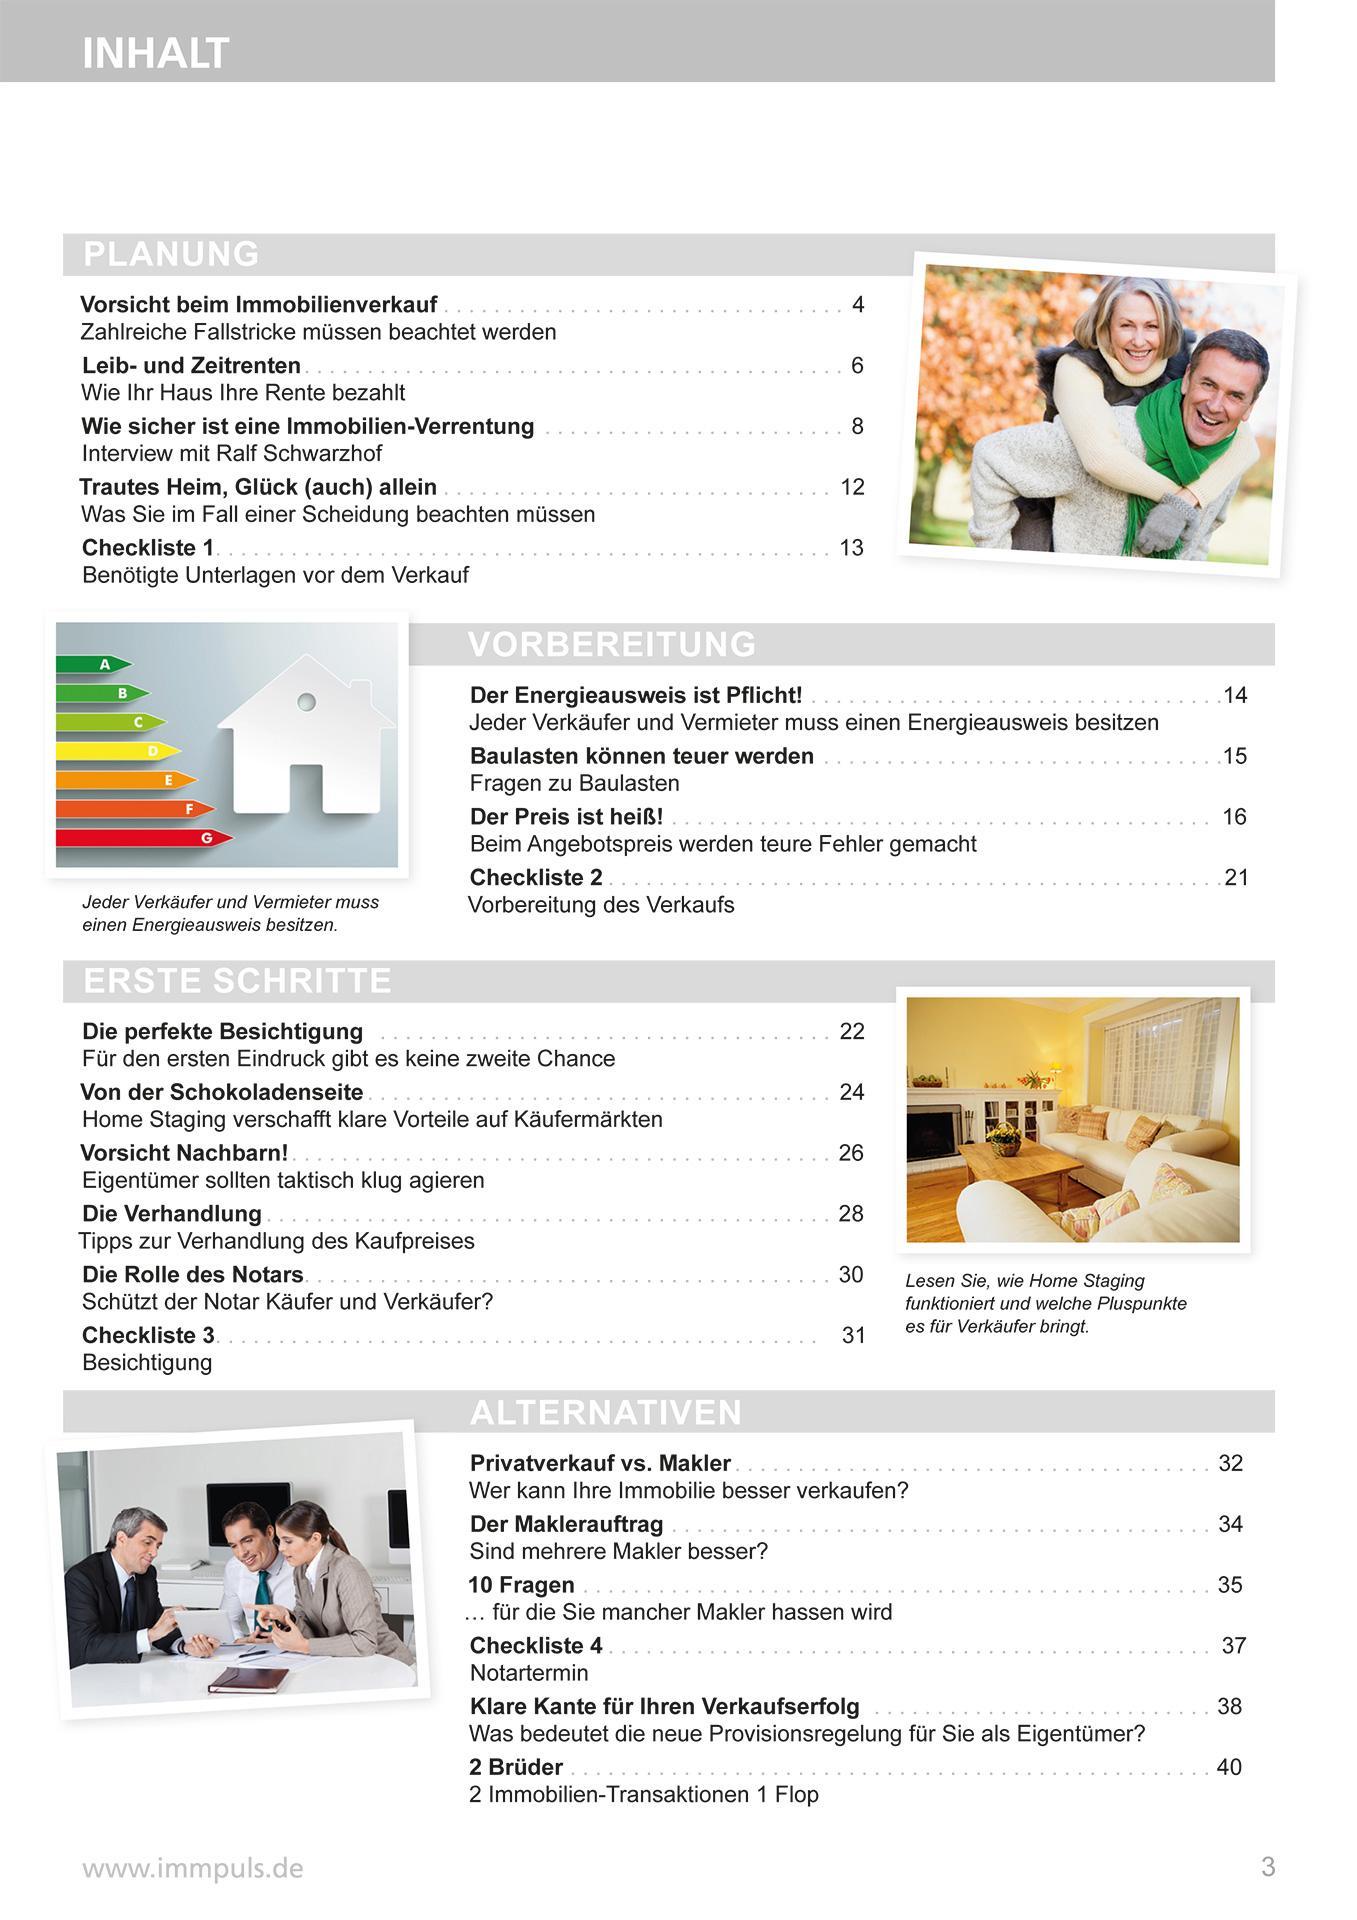 nach-hause-immobilien-immpuls_2021_seite1 Nachhause Immobilien - Ratgeber